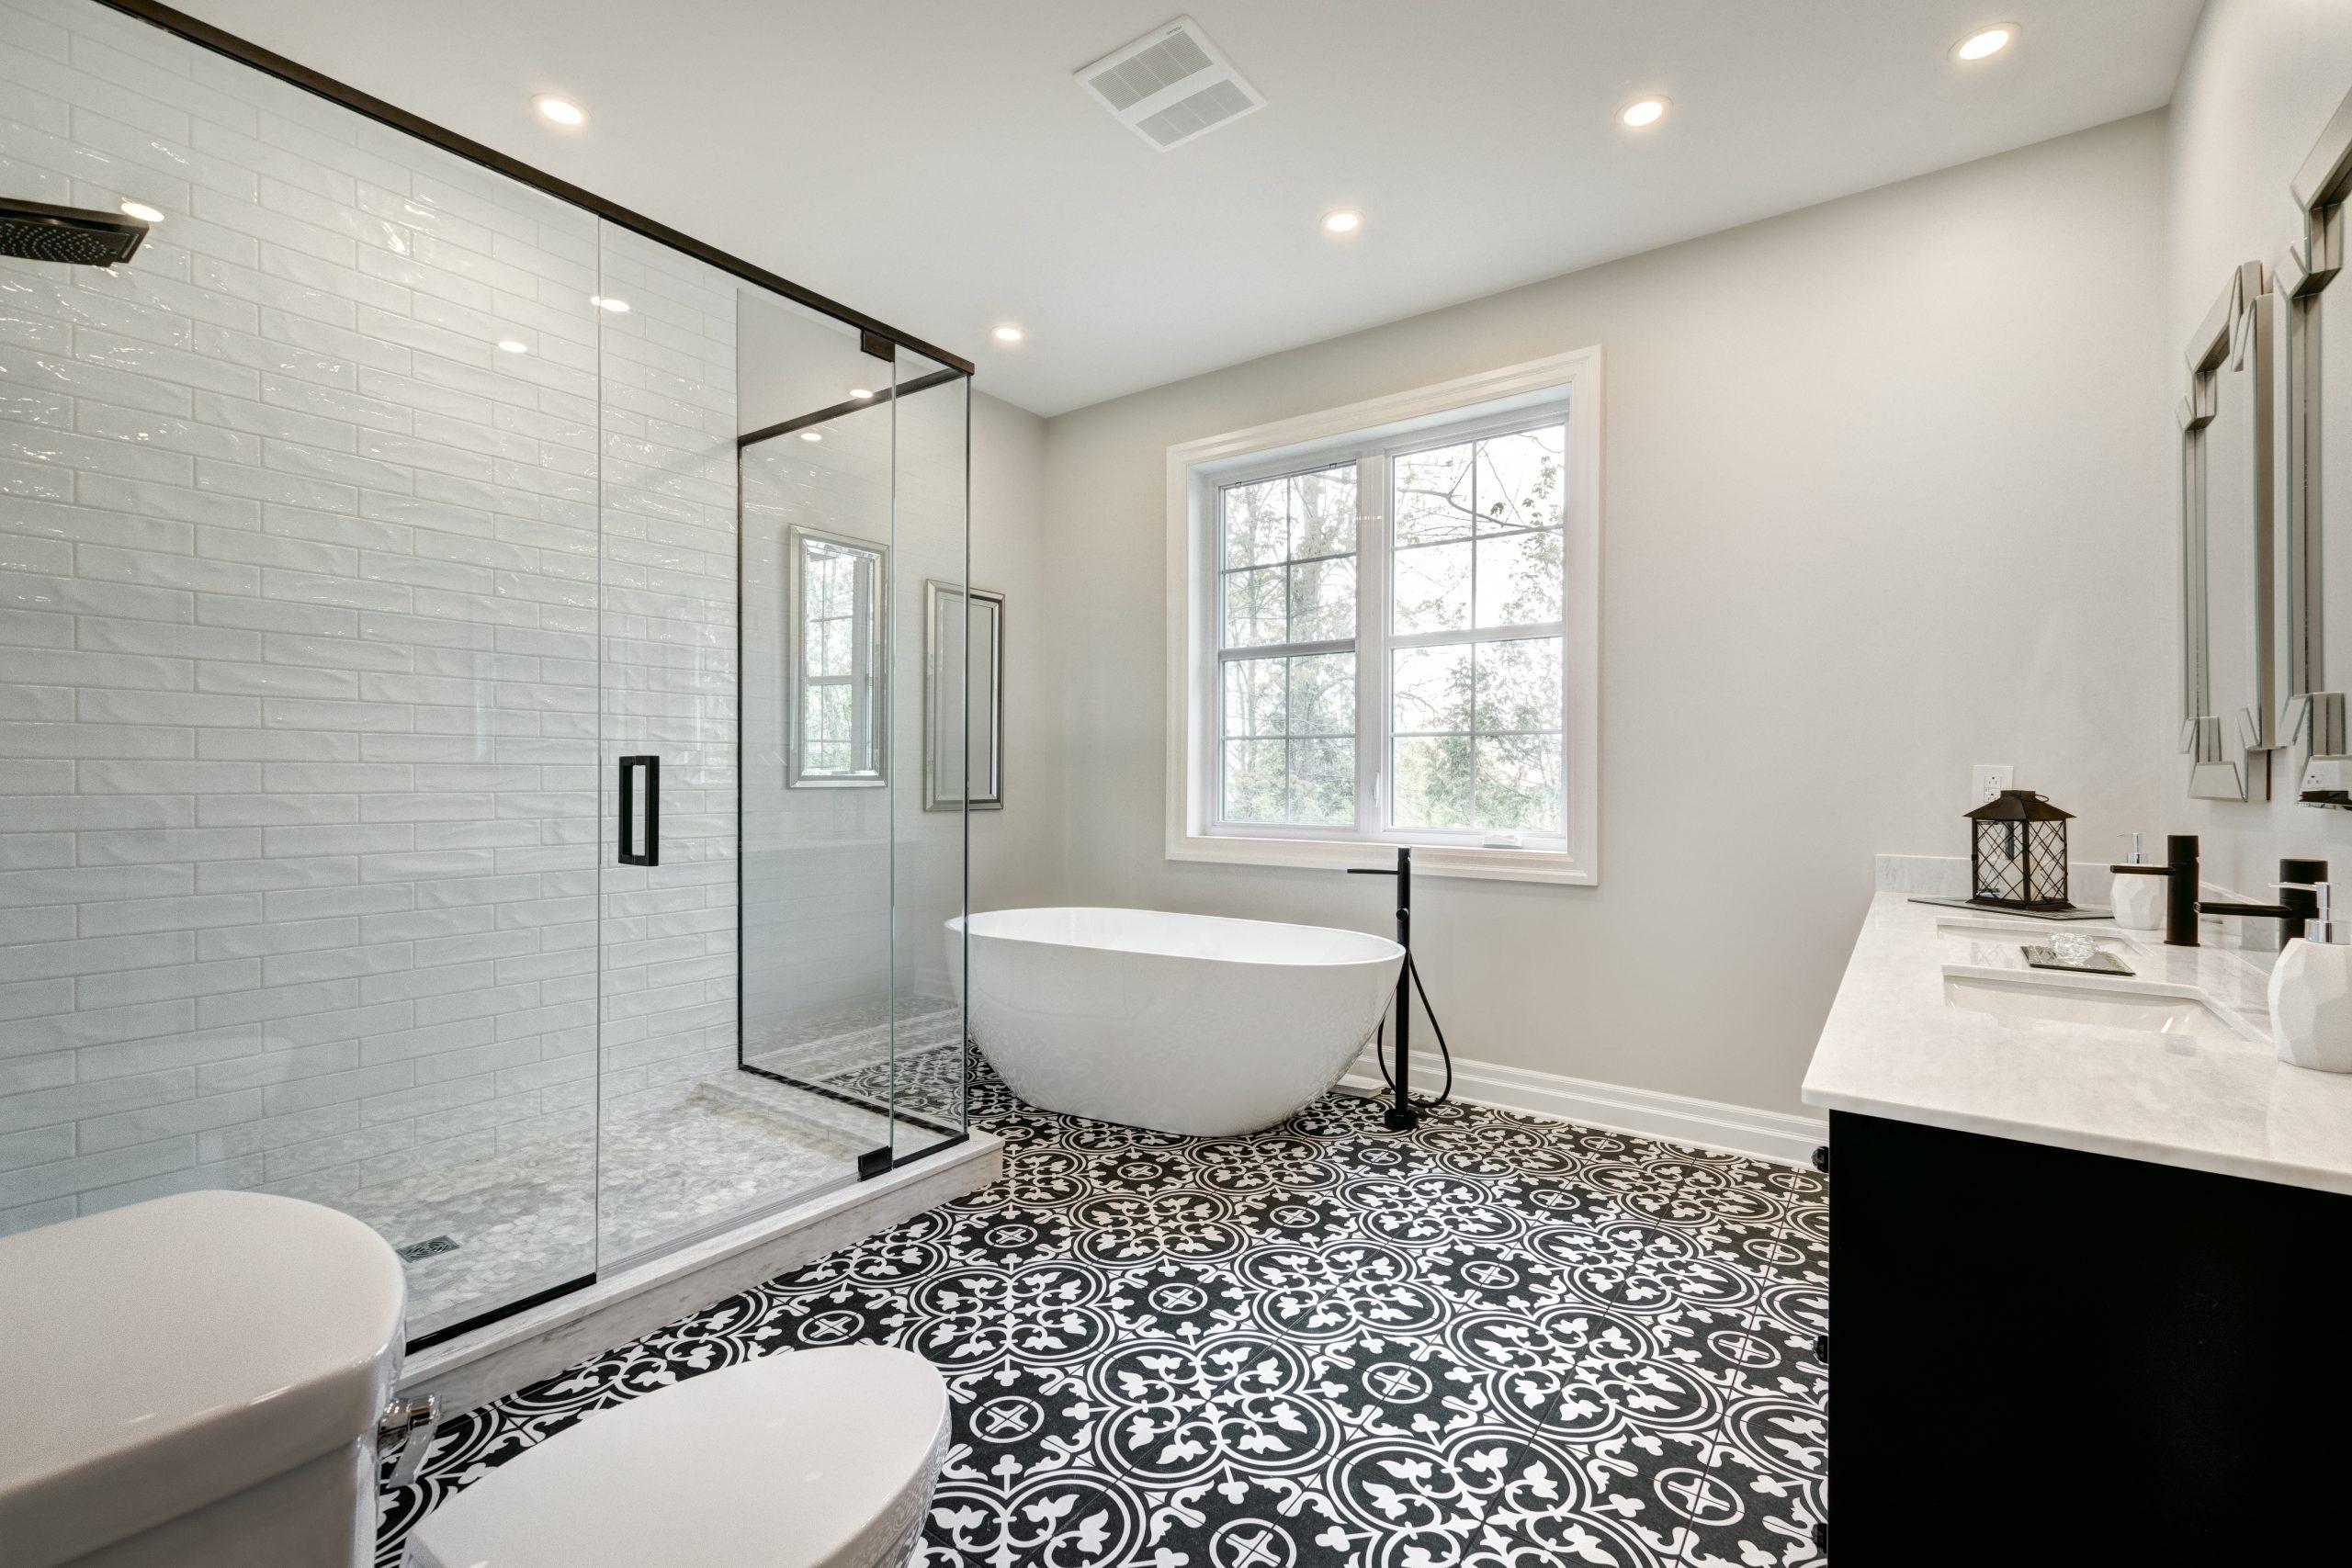 Bathroom Remodeling in Pasadena, CA